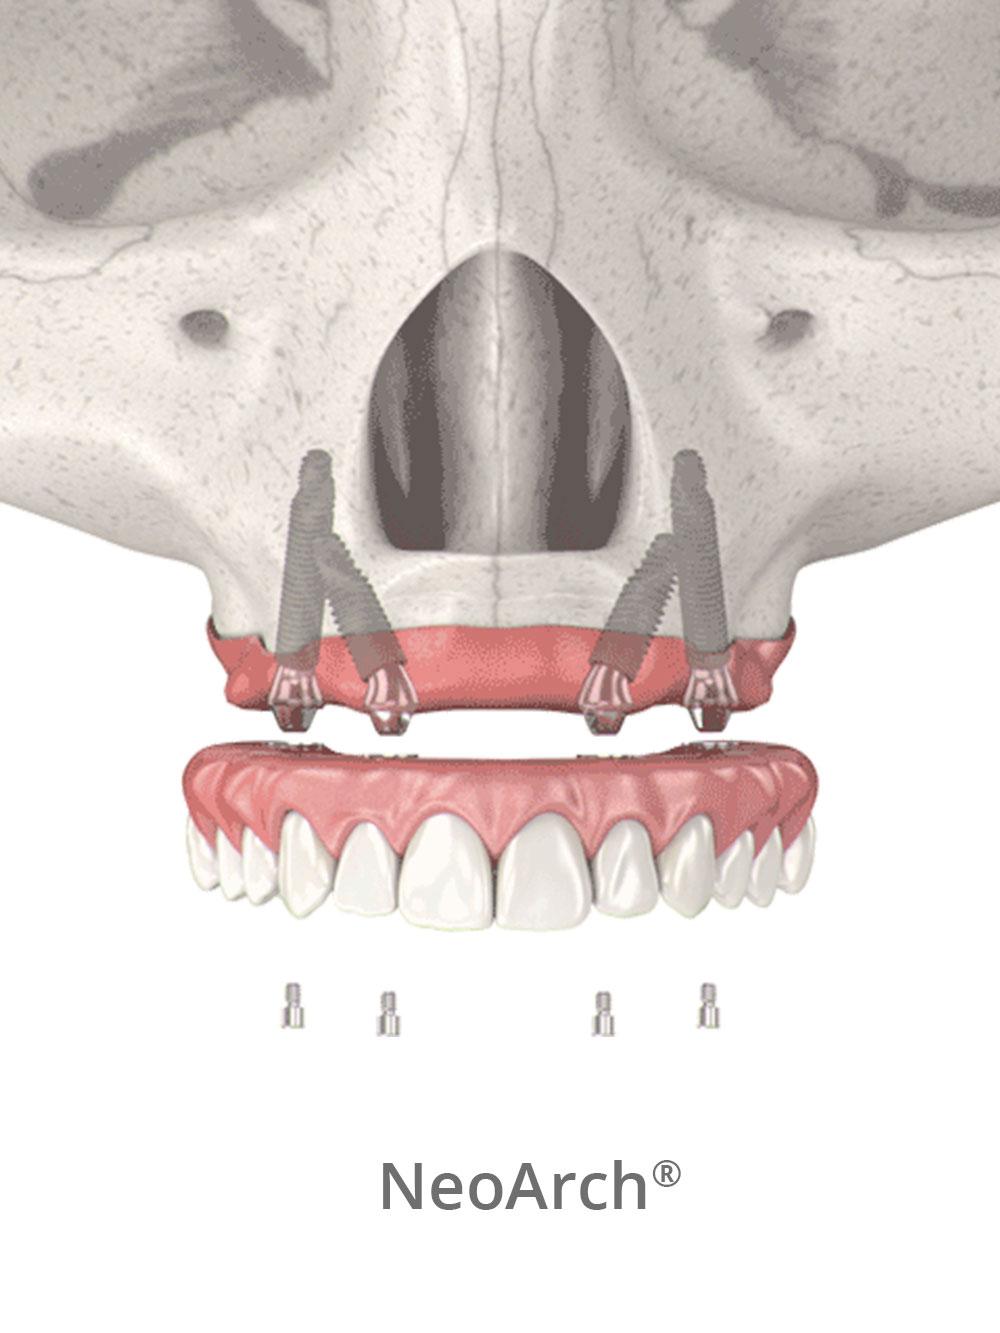 NeoArch same day teeth